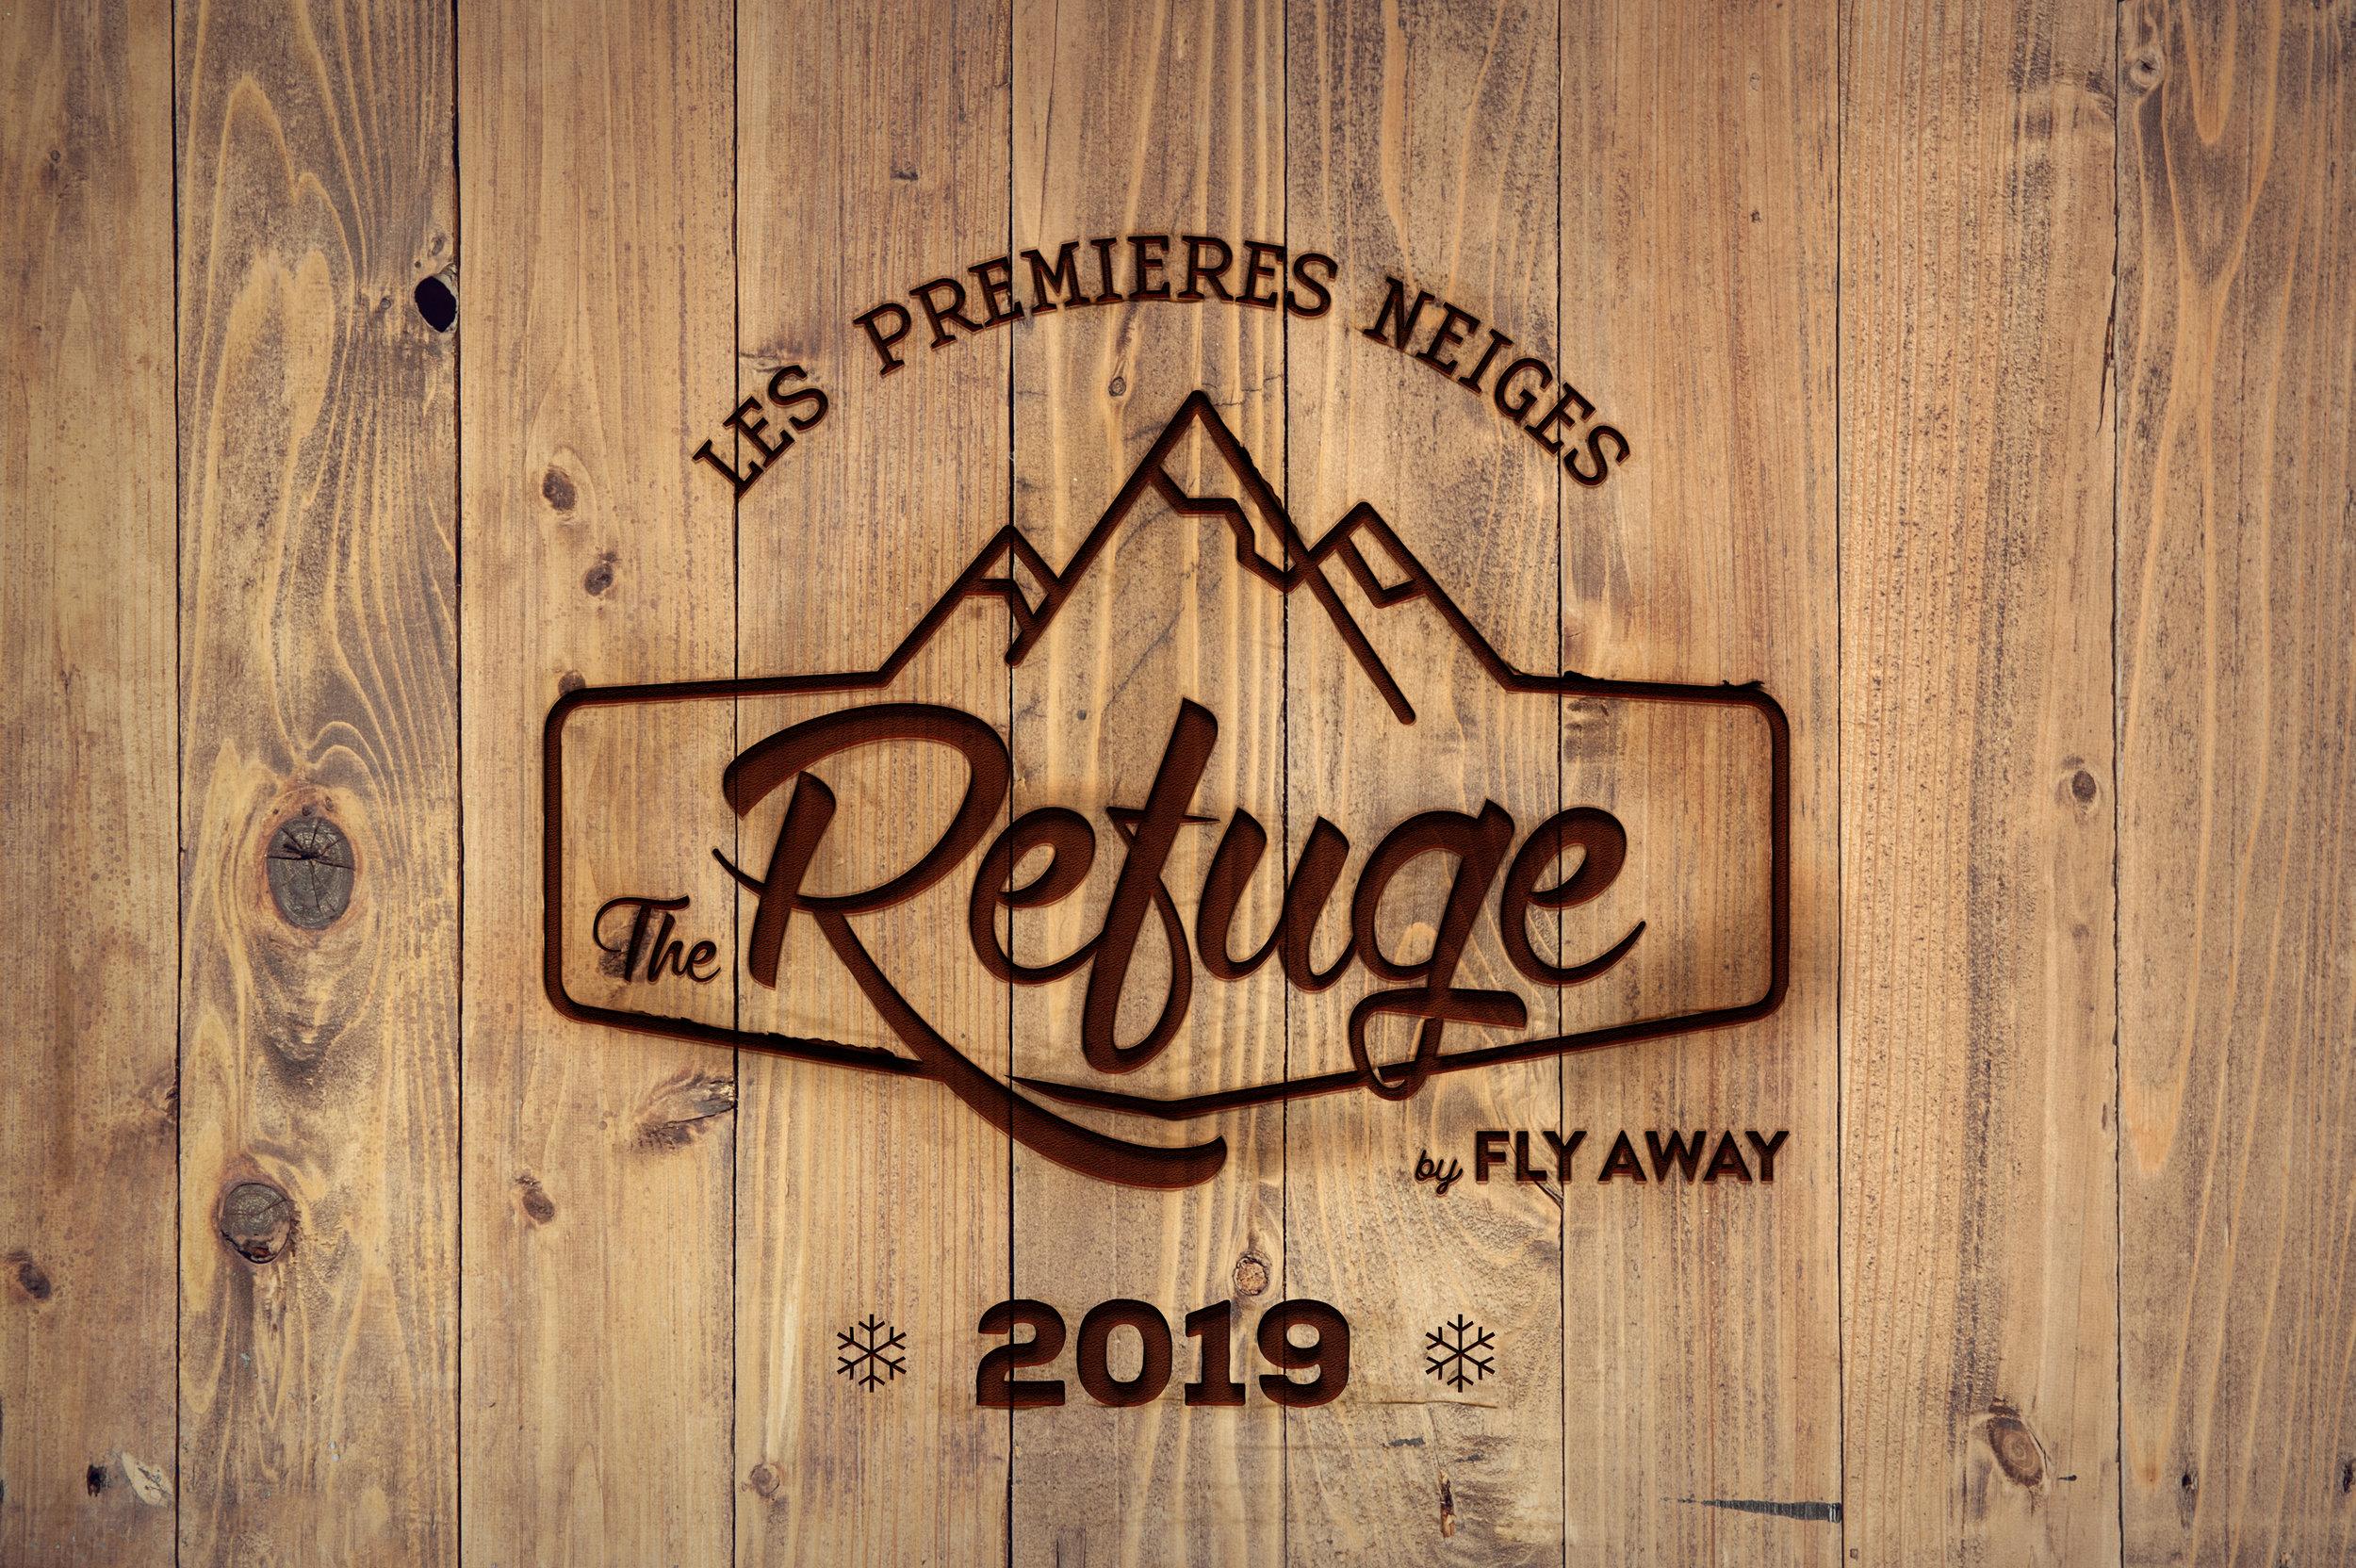 RFG-logo-2019-wood.jpg